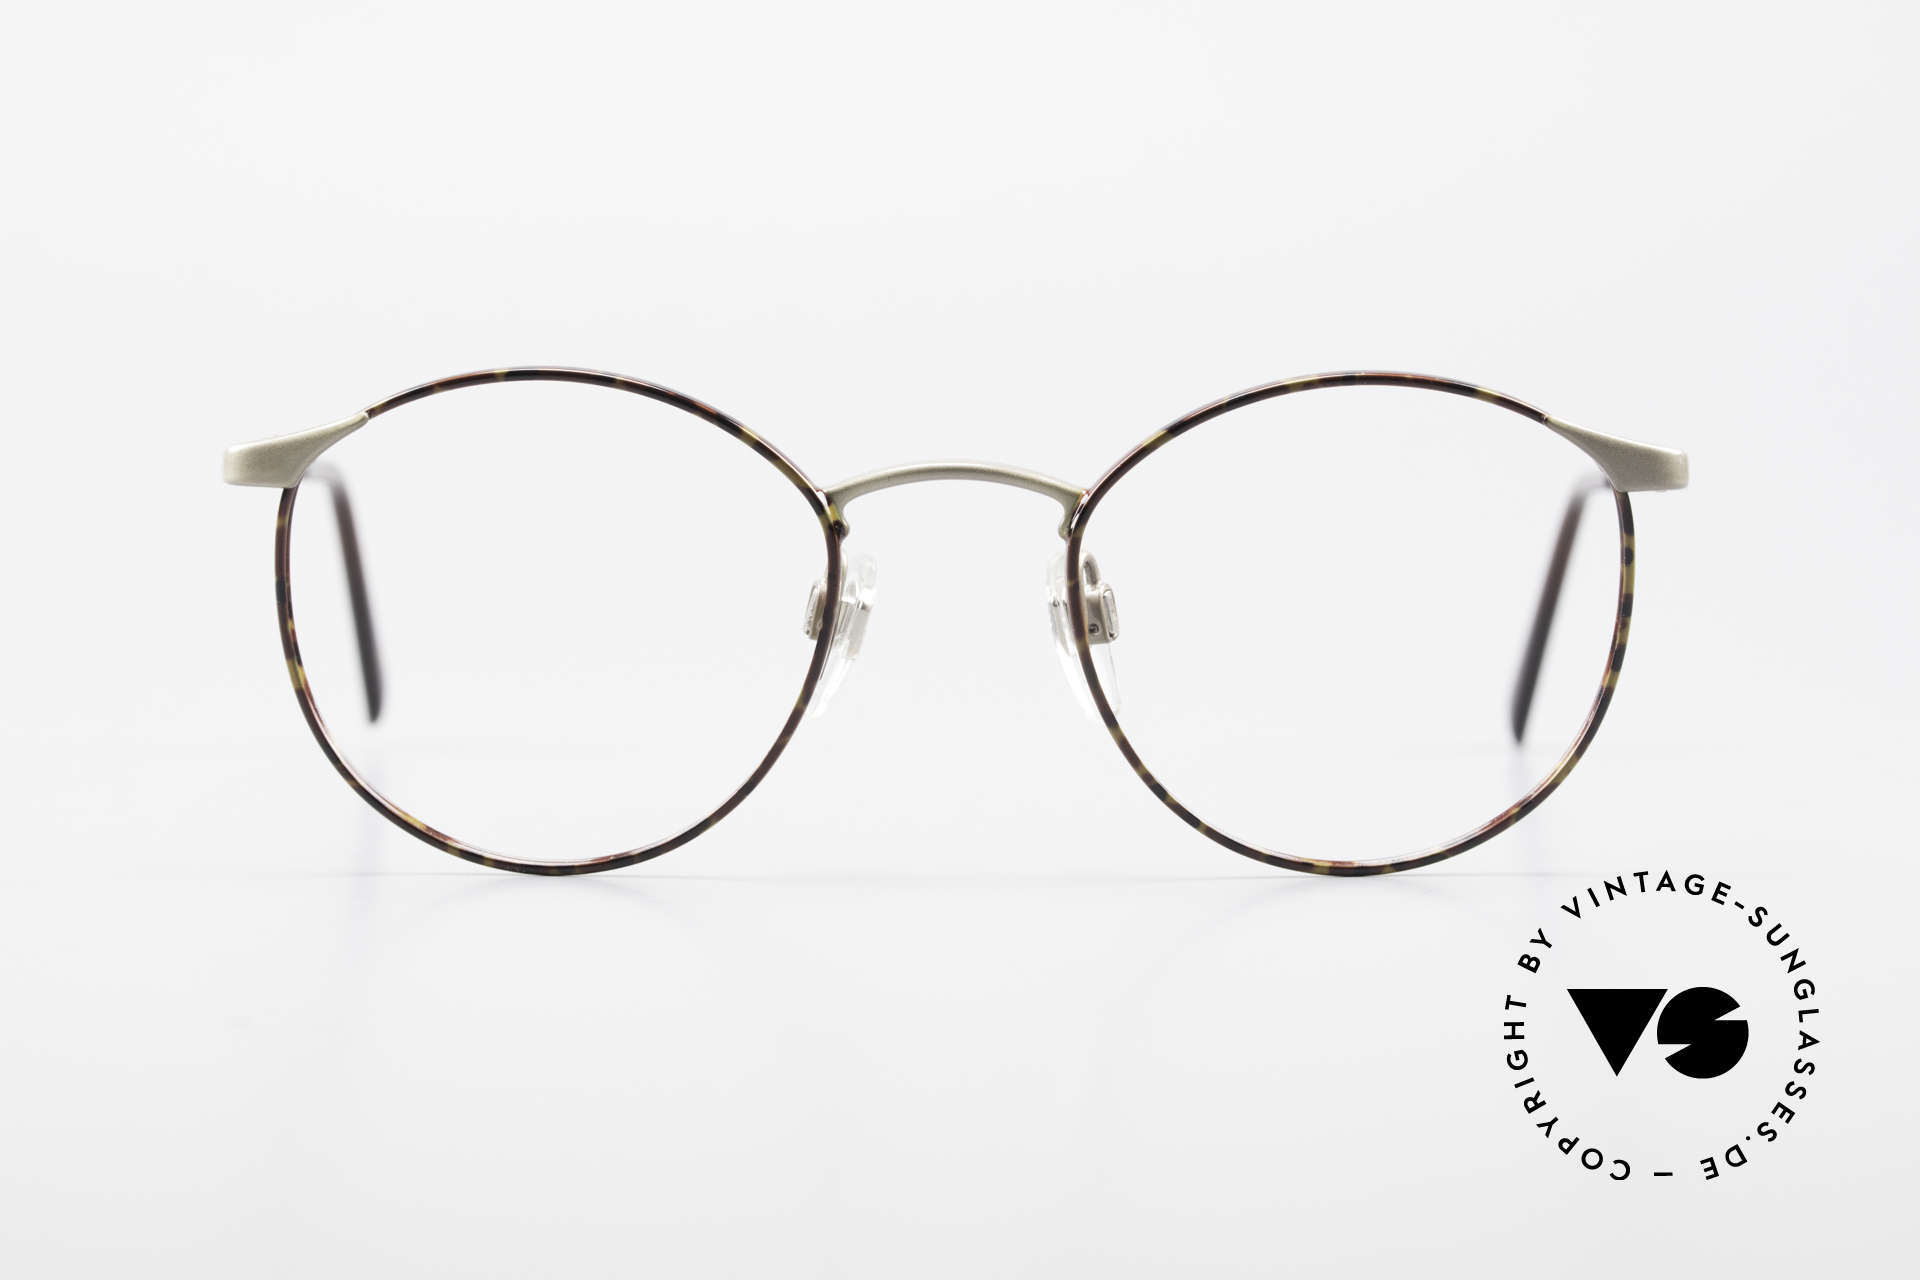 Giorgio Armani 163 Small Panto Eyeglass-Frame, world famous 'panto'-design .. a real eyewear classic, Made for Men and Women